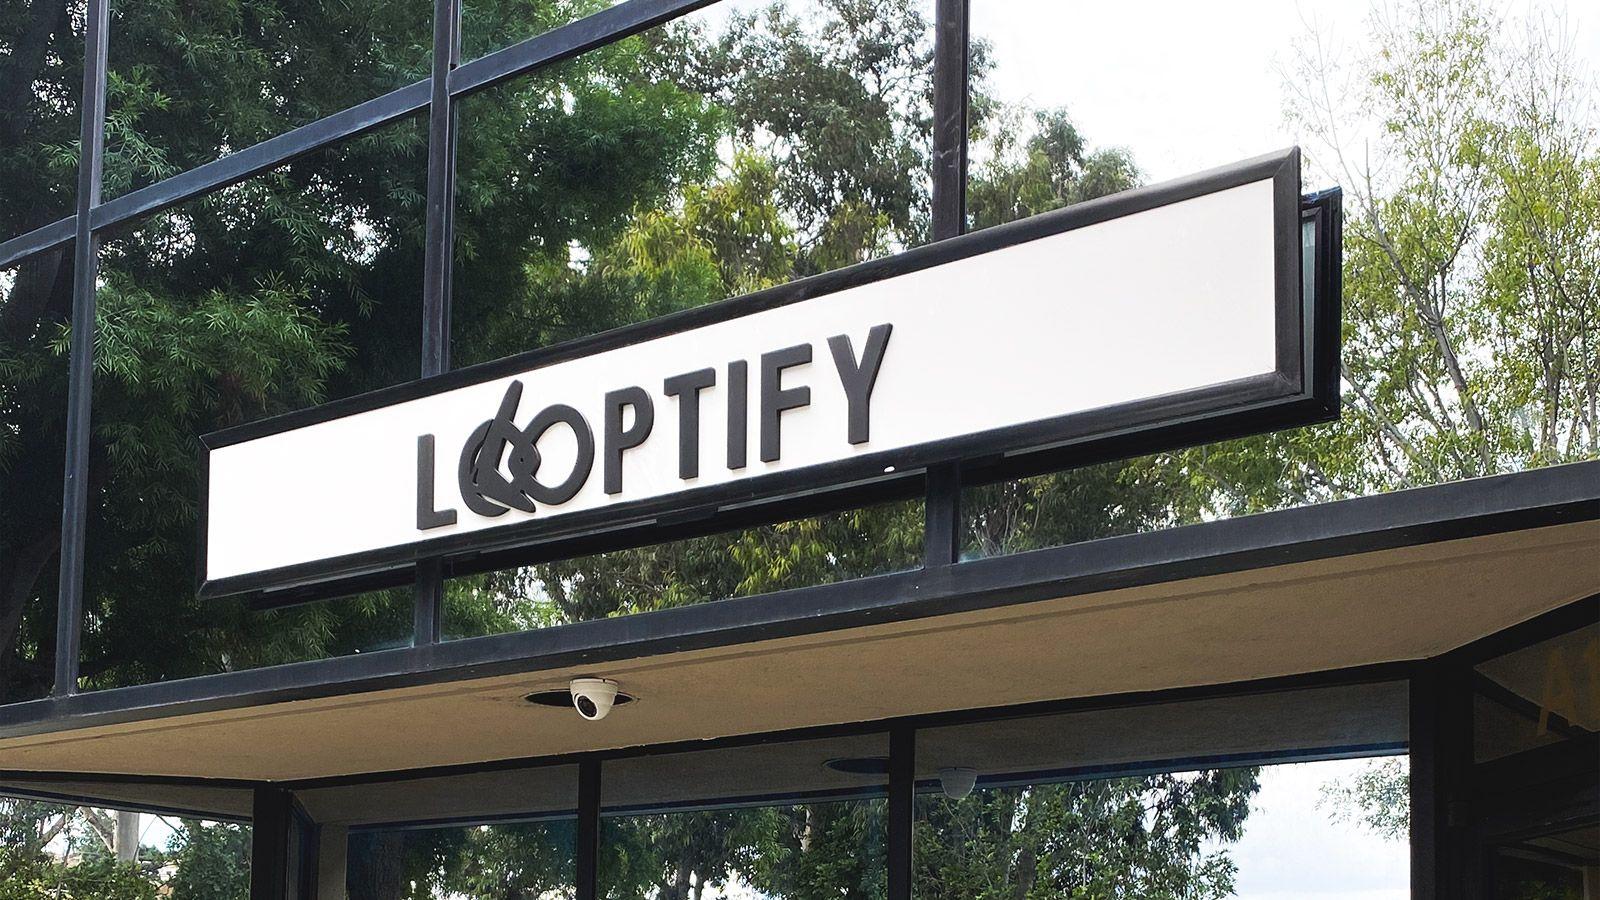 Looptify PVC 3D letters